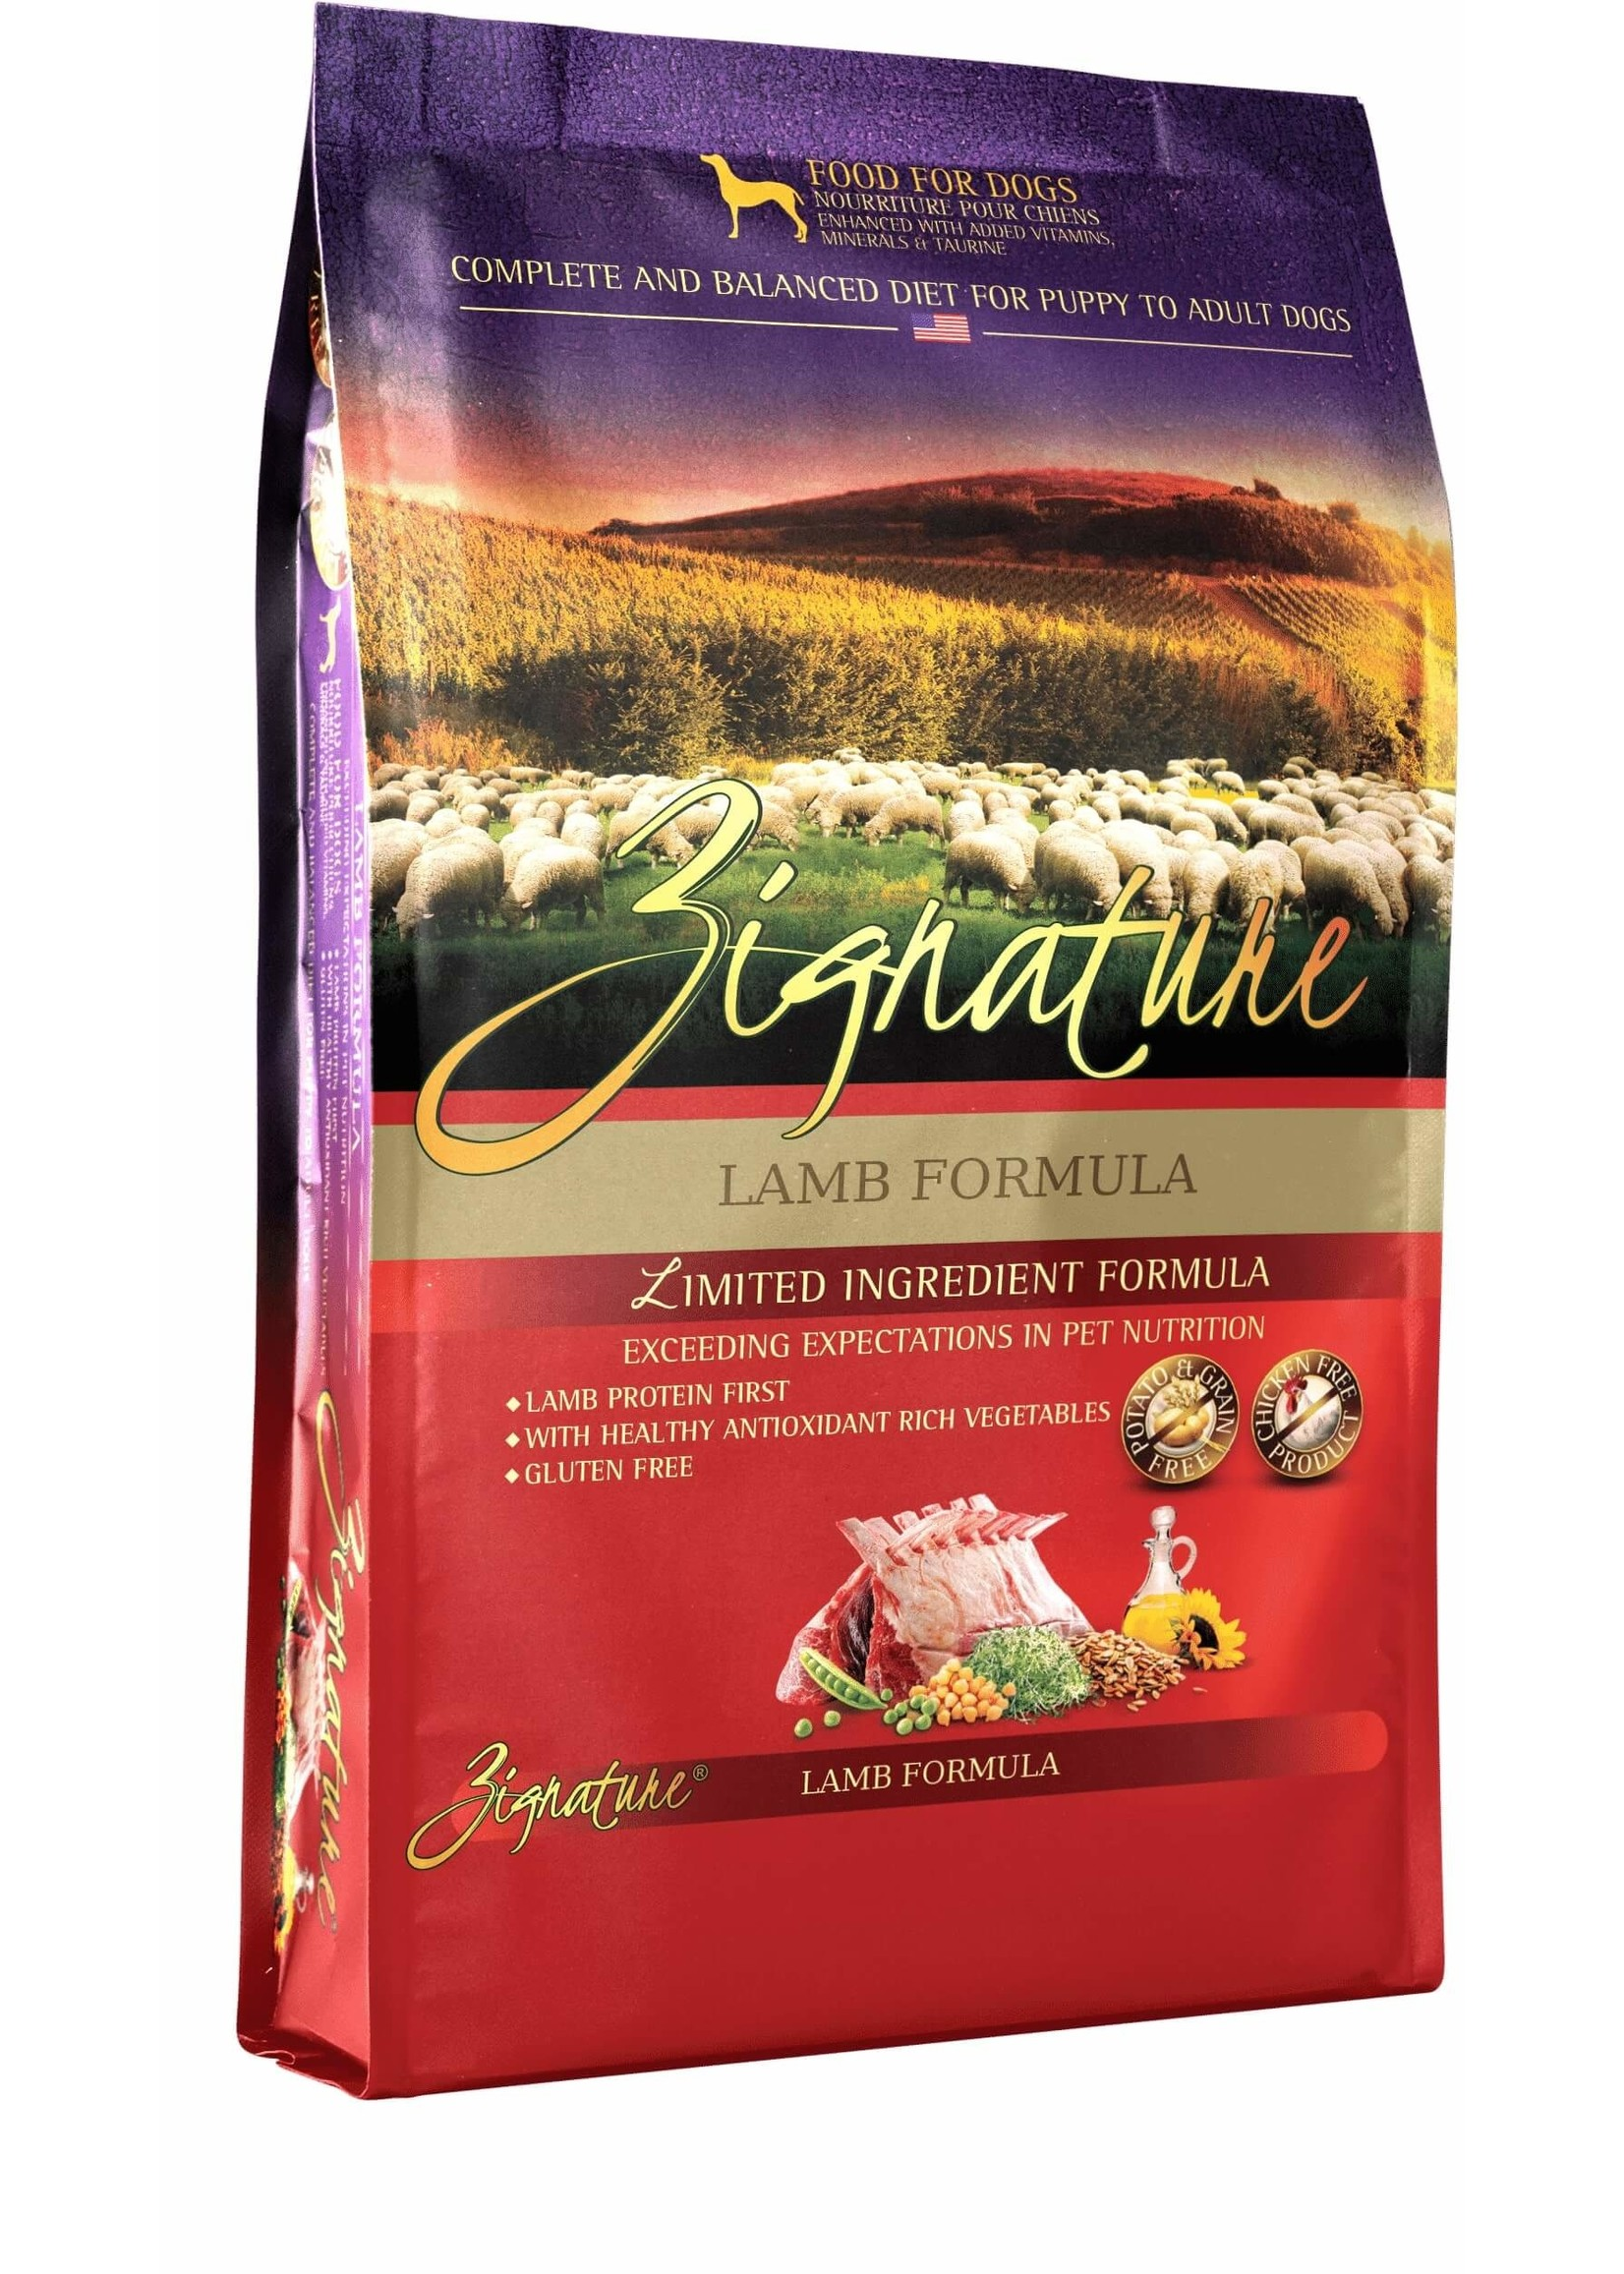 Zignature Zignature Limited Ingredient Formula Dog Food Lamb